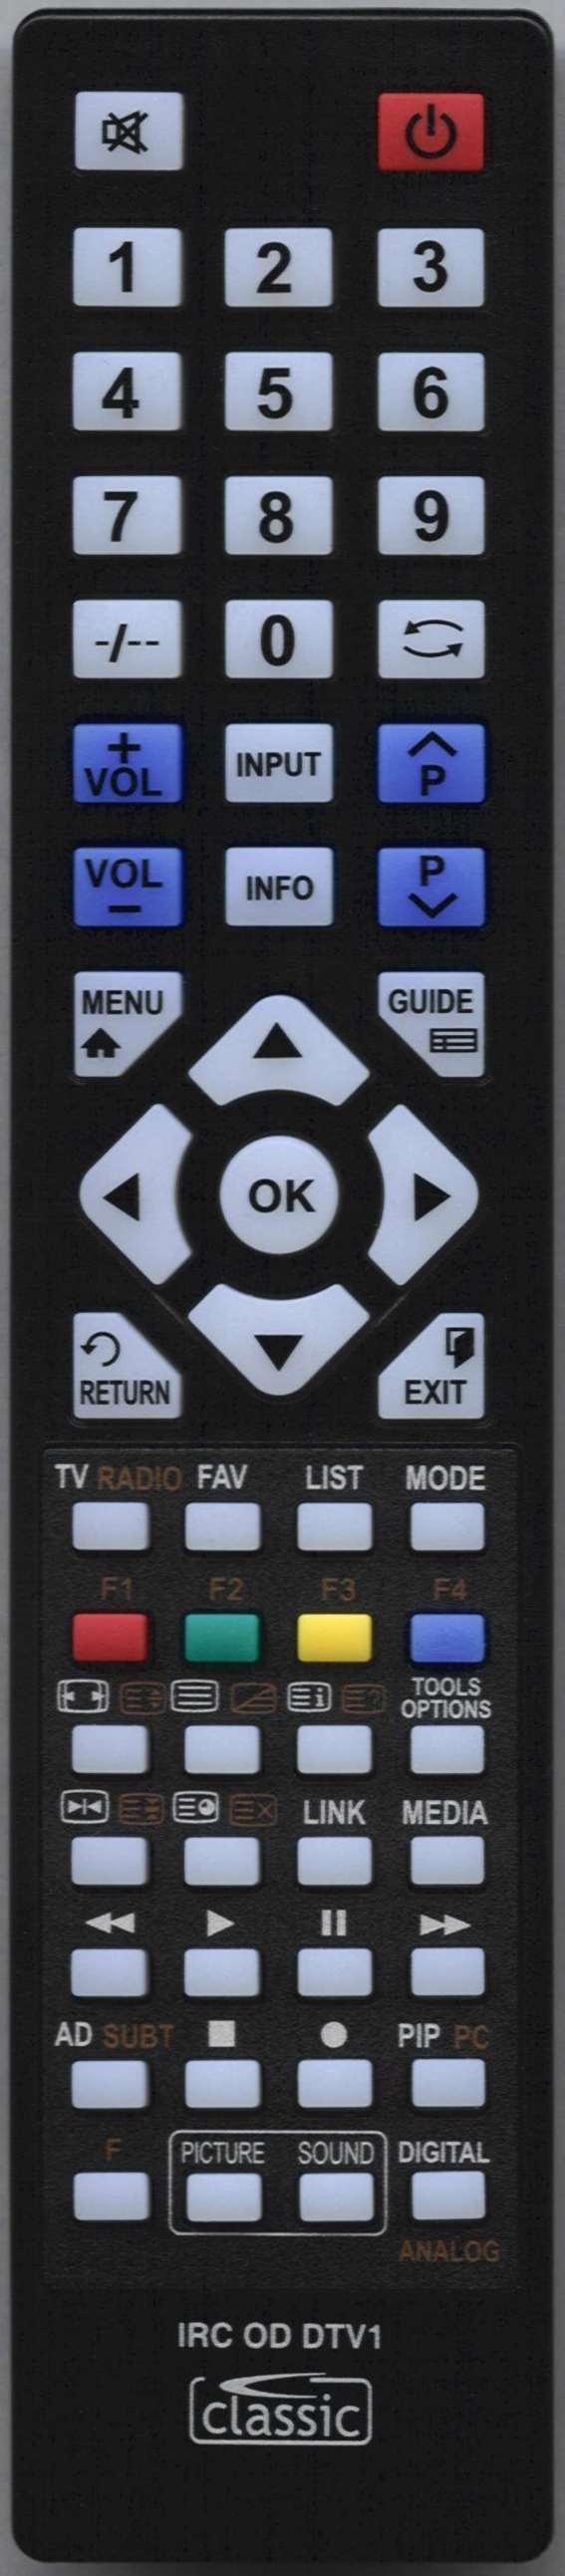 WHARFEDALE VC532237 Remote Control